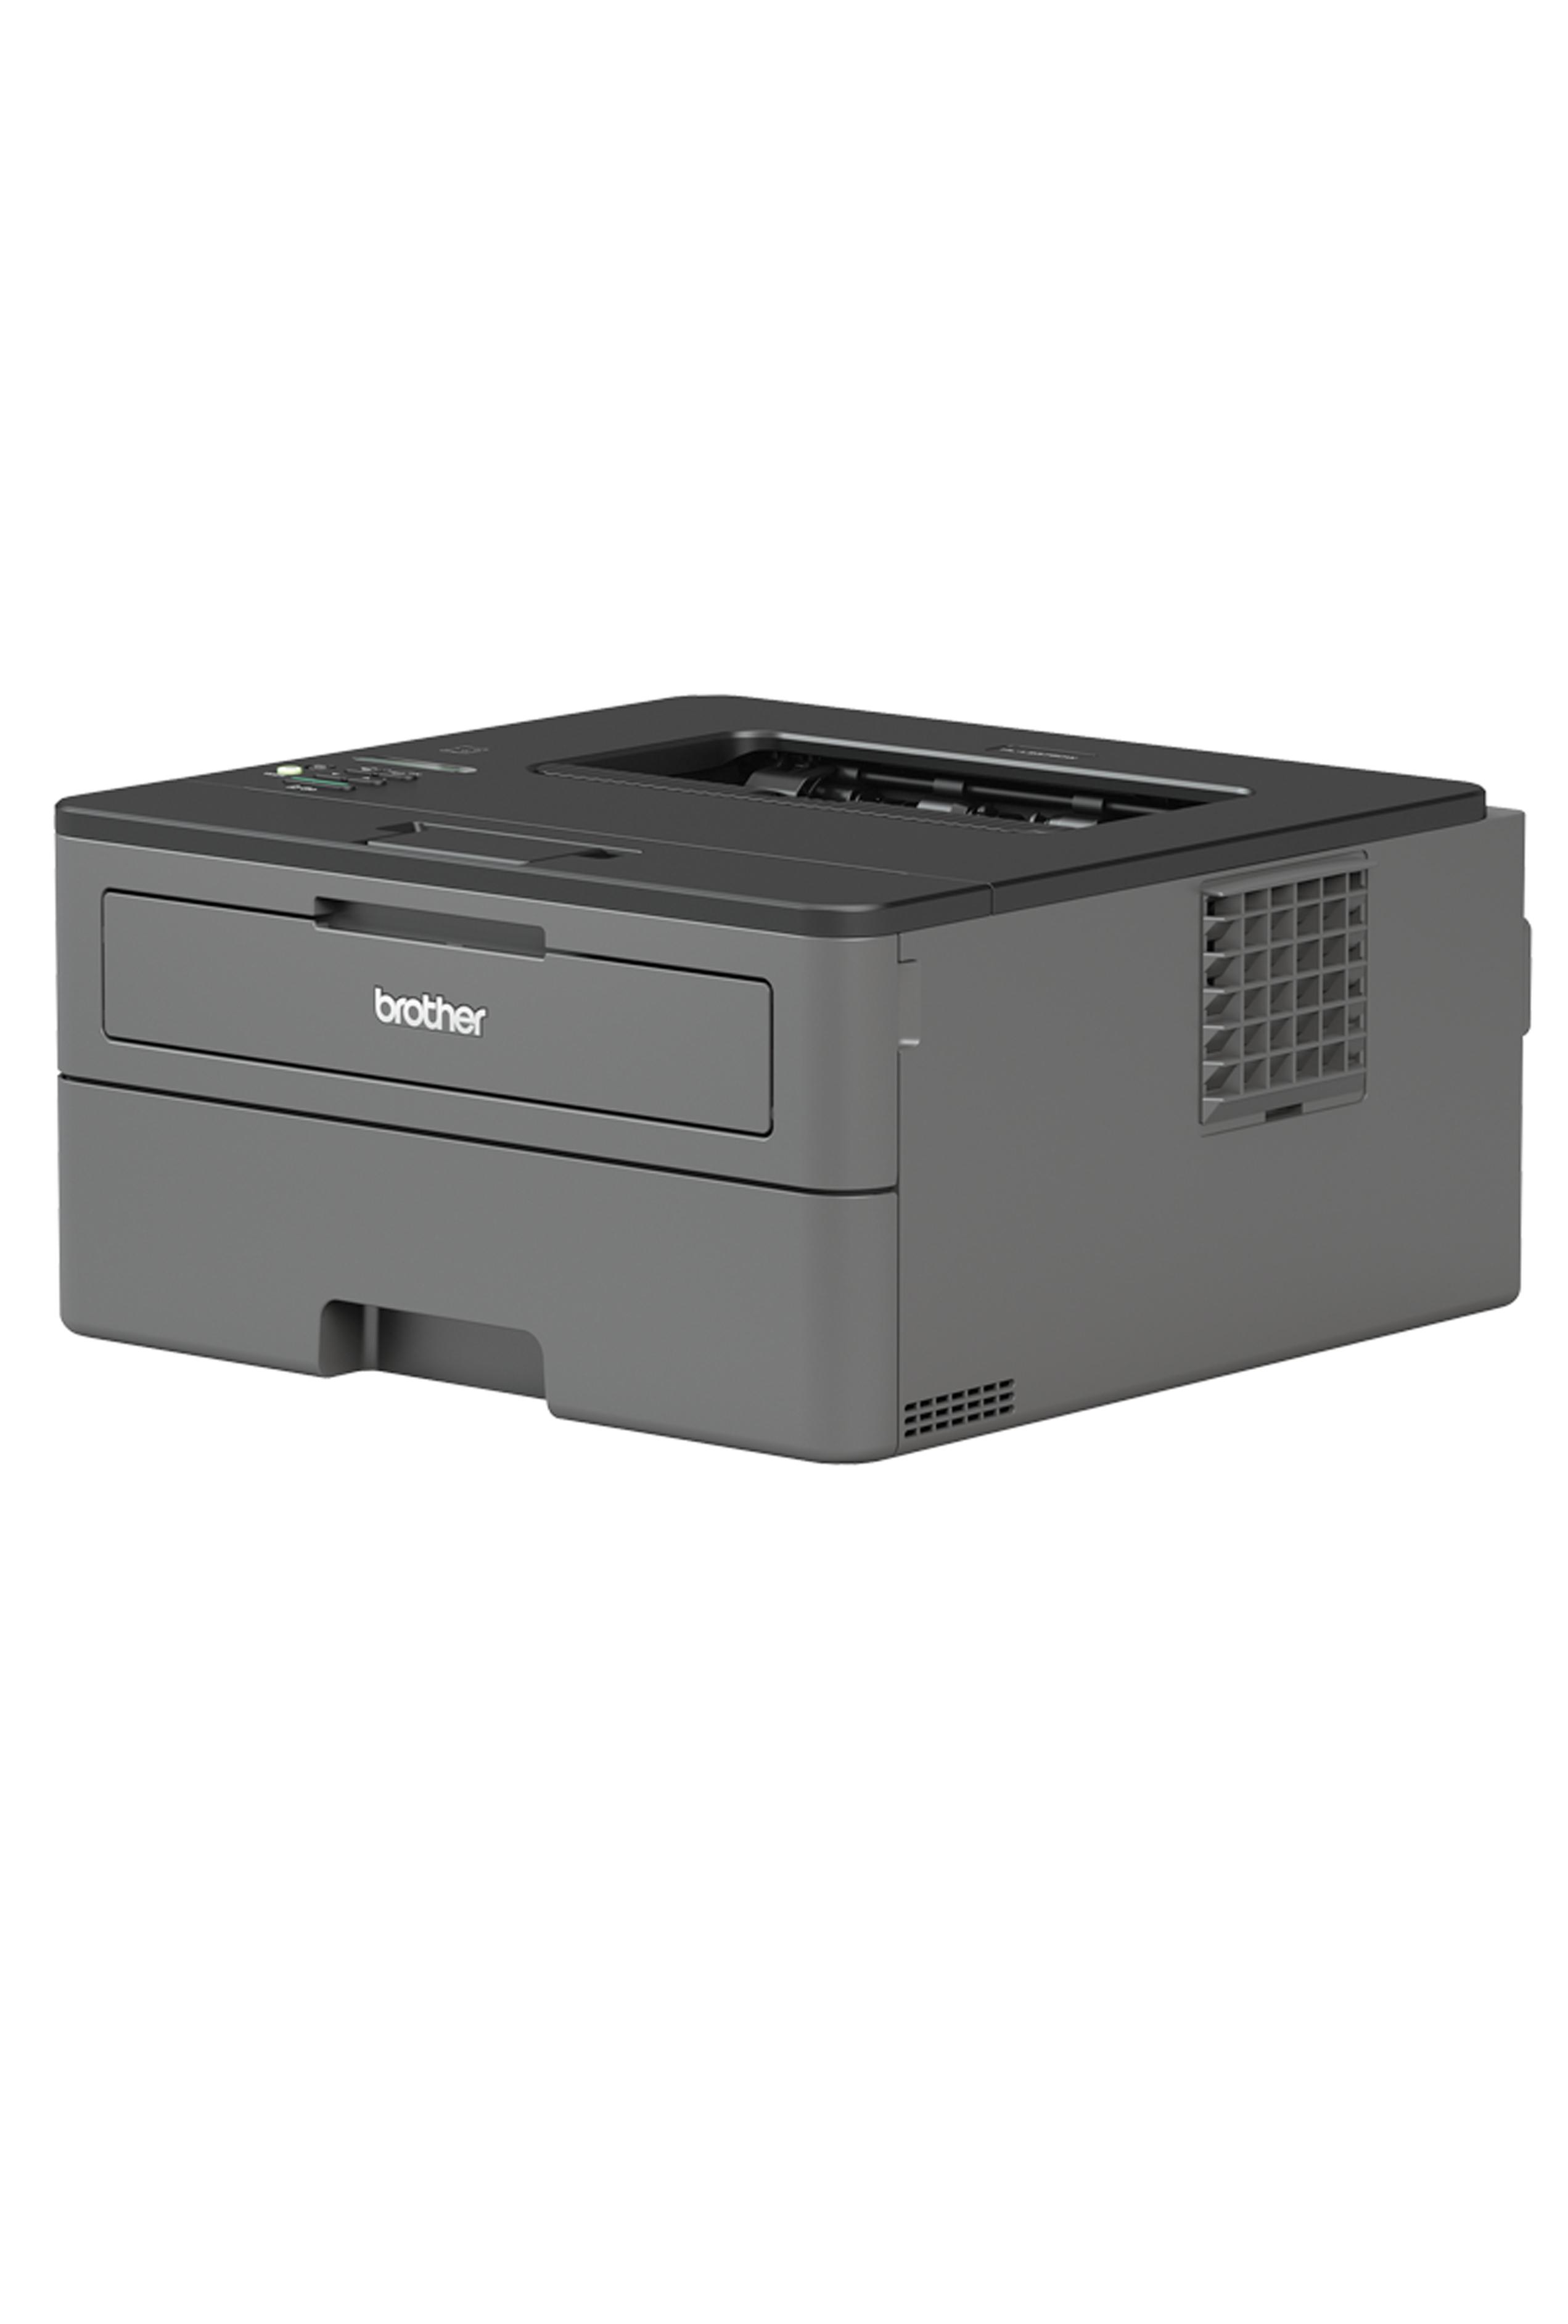 Brother HL-L2370DW Compact Laser Printer